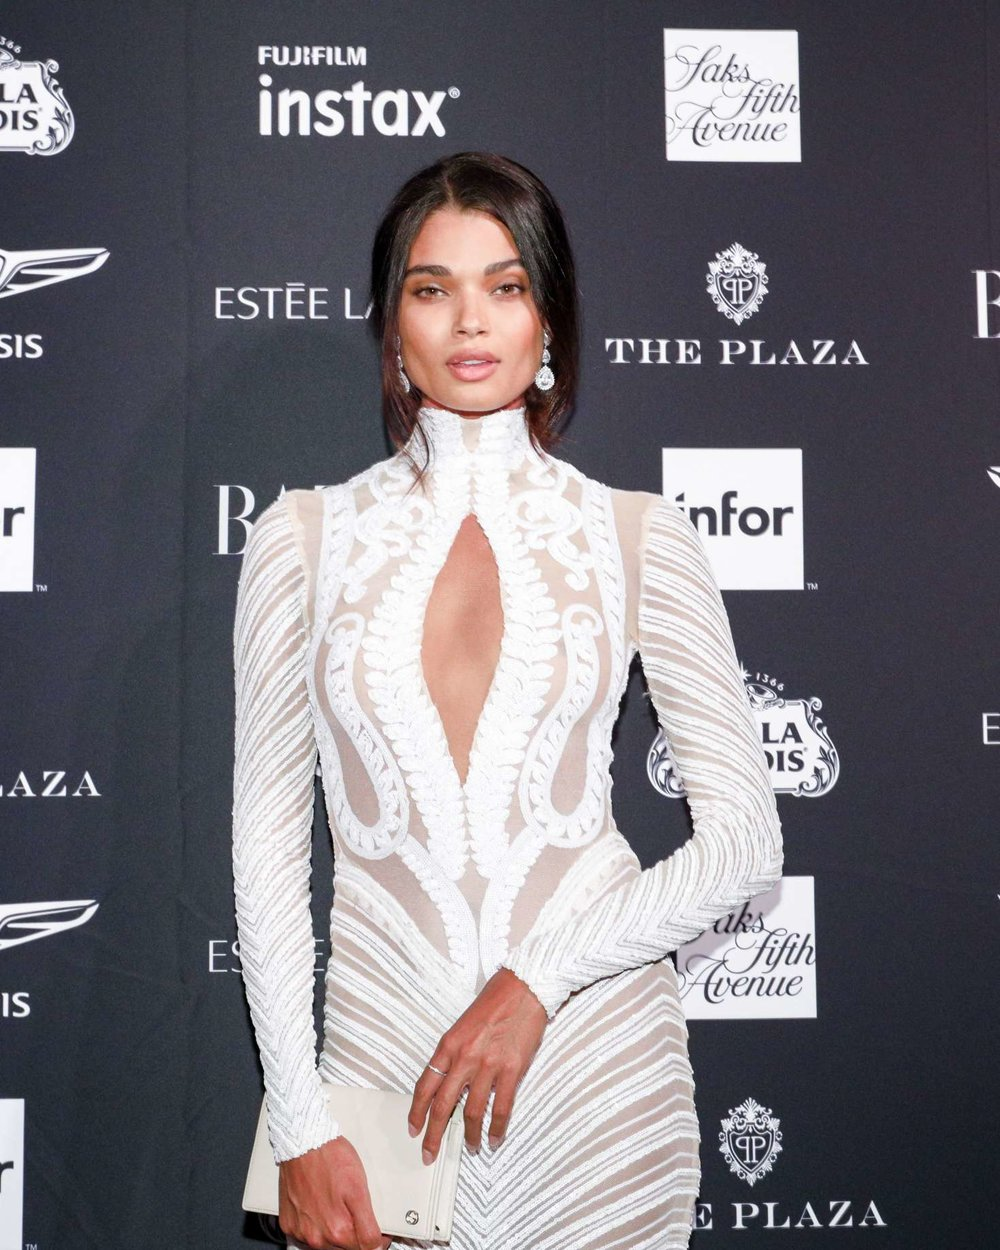 Daniela-Braga_-2018-Harpers-Bazaar-ICONS-Party--03.jpg